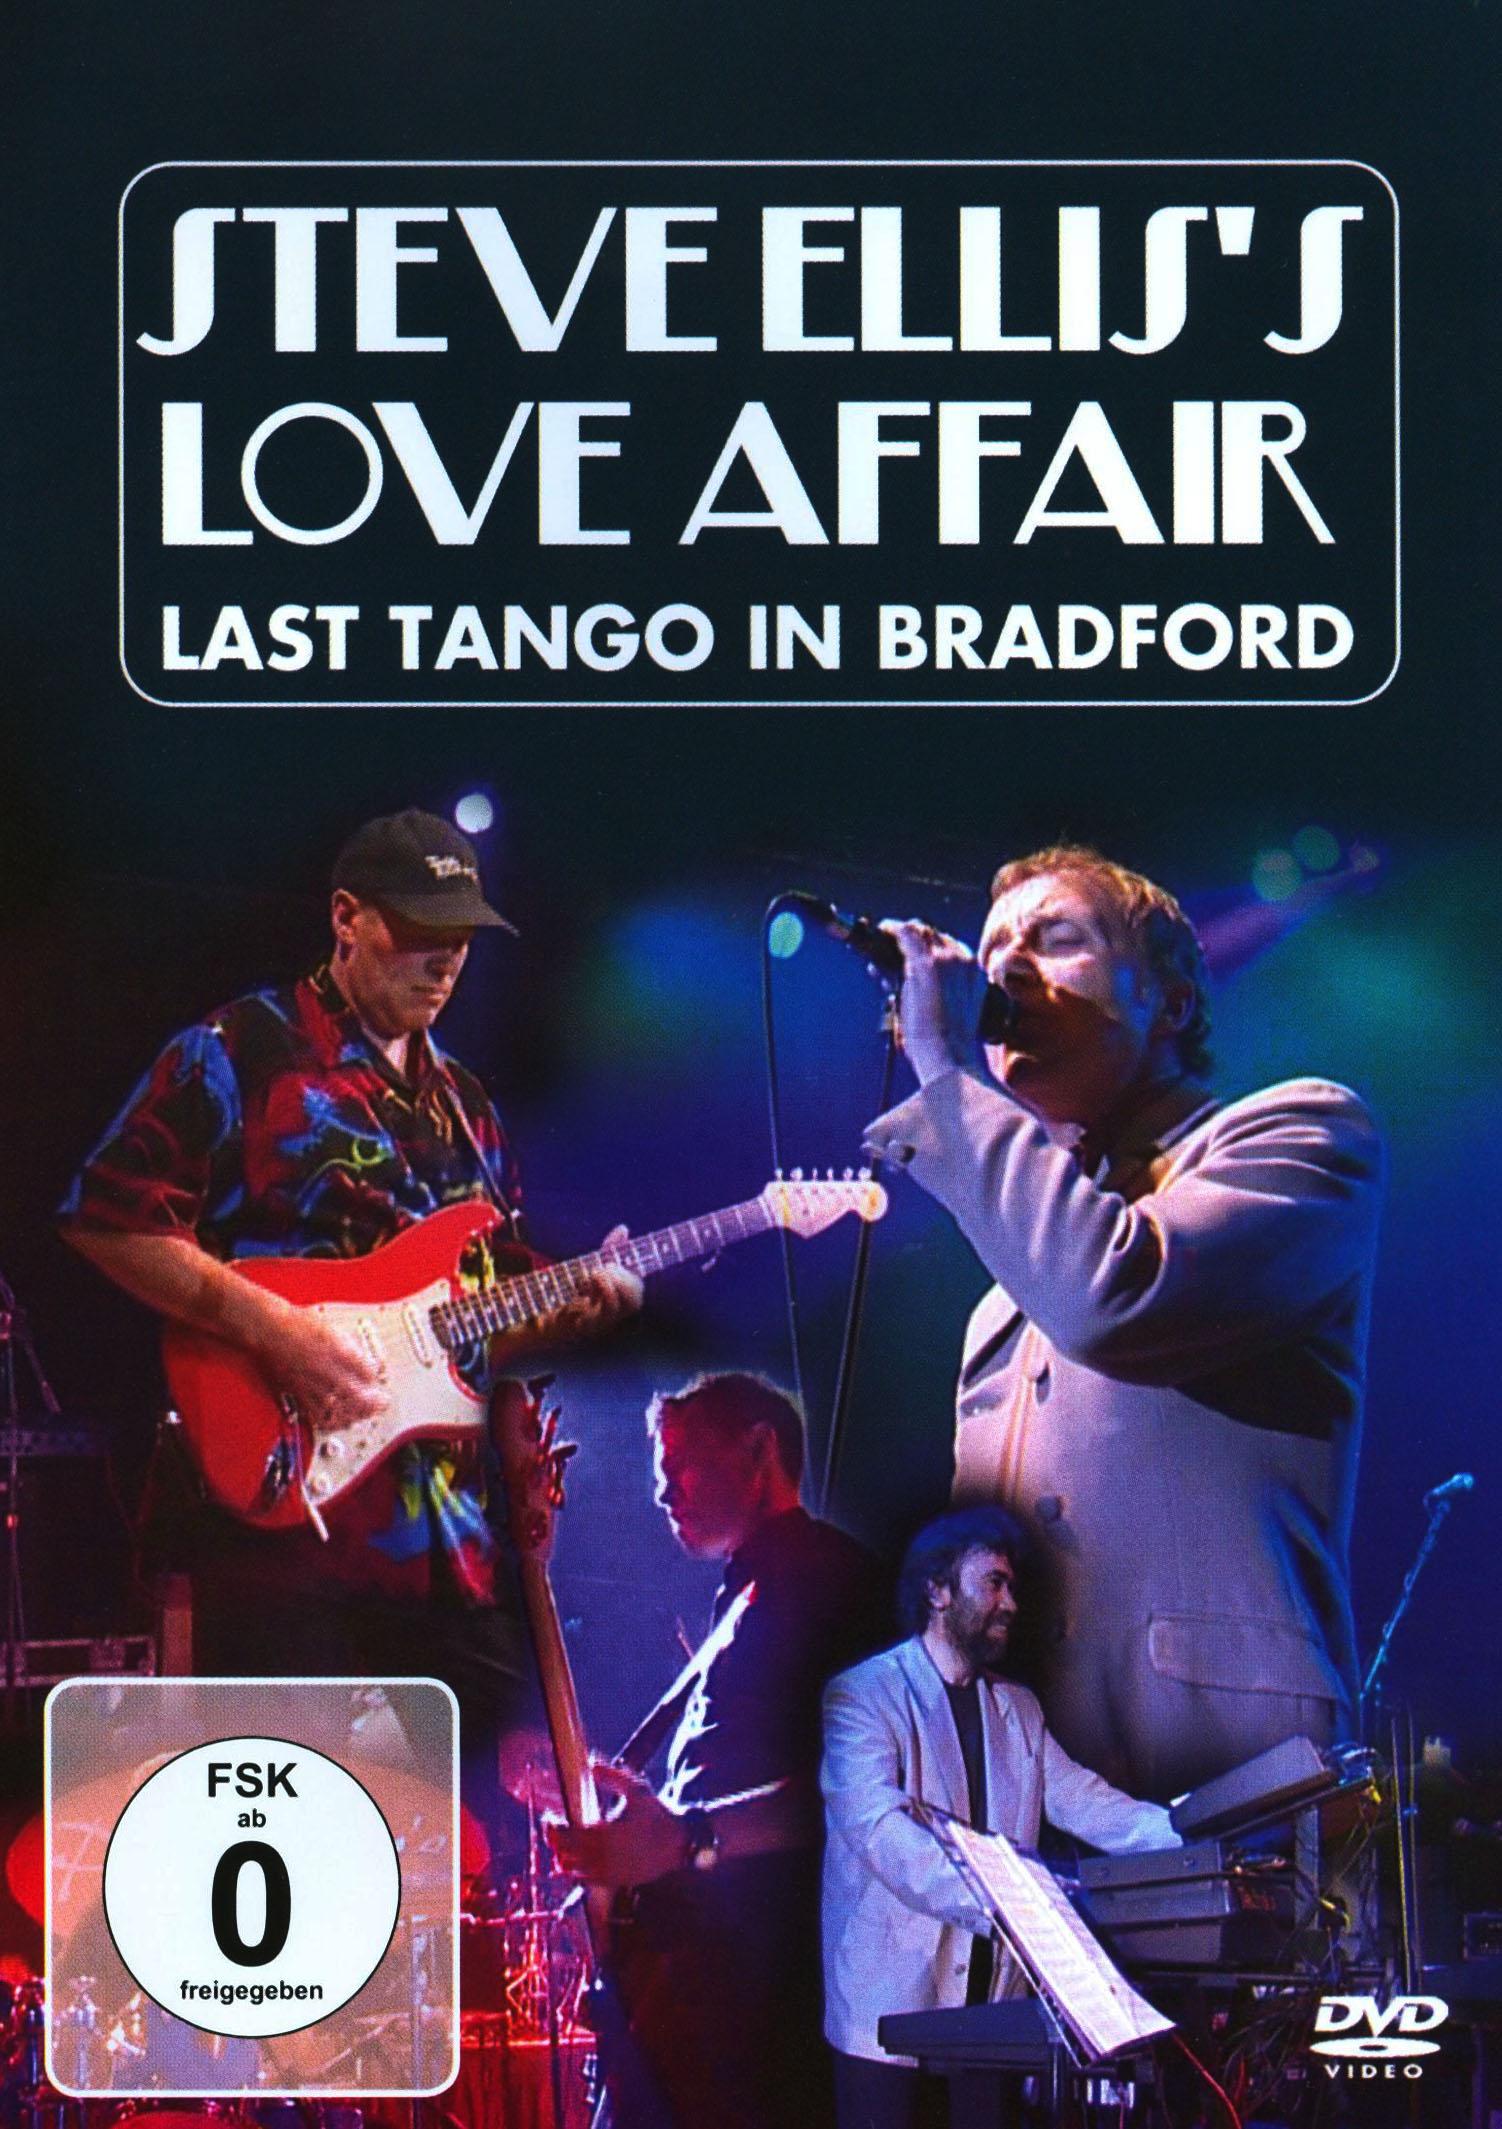 Steve Ellis's Love Affair: Last Tango In Bradford